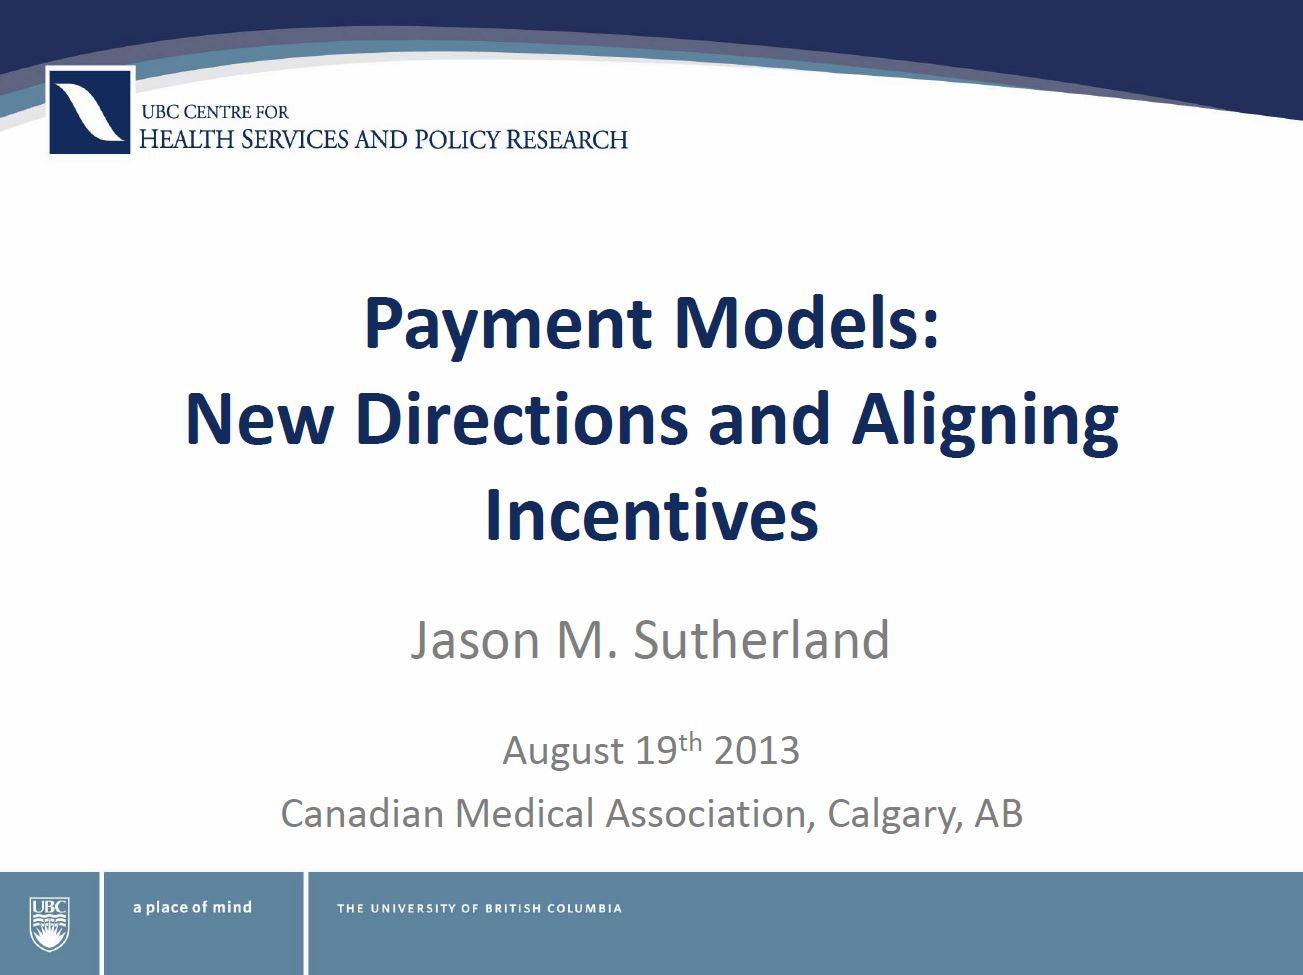 Payment models